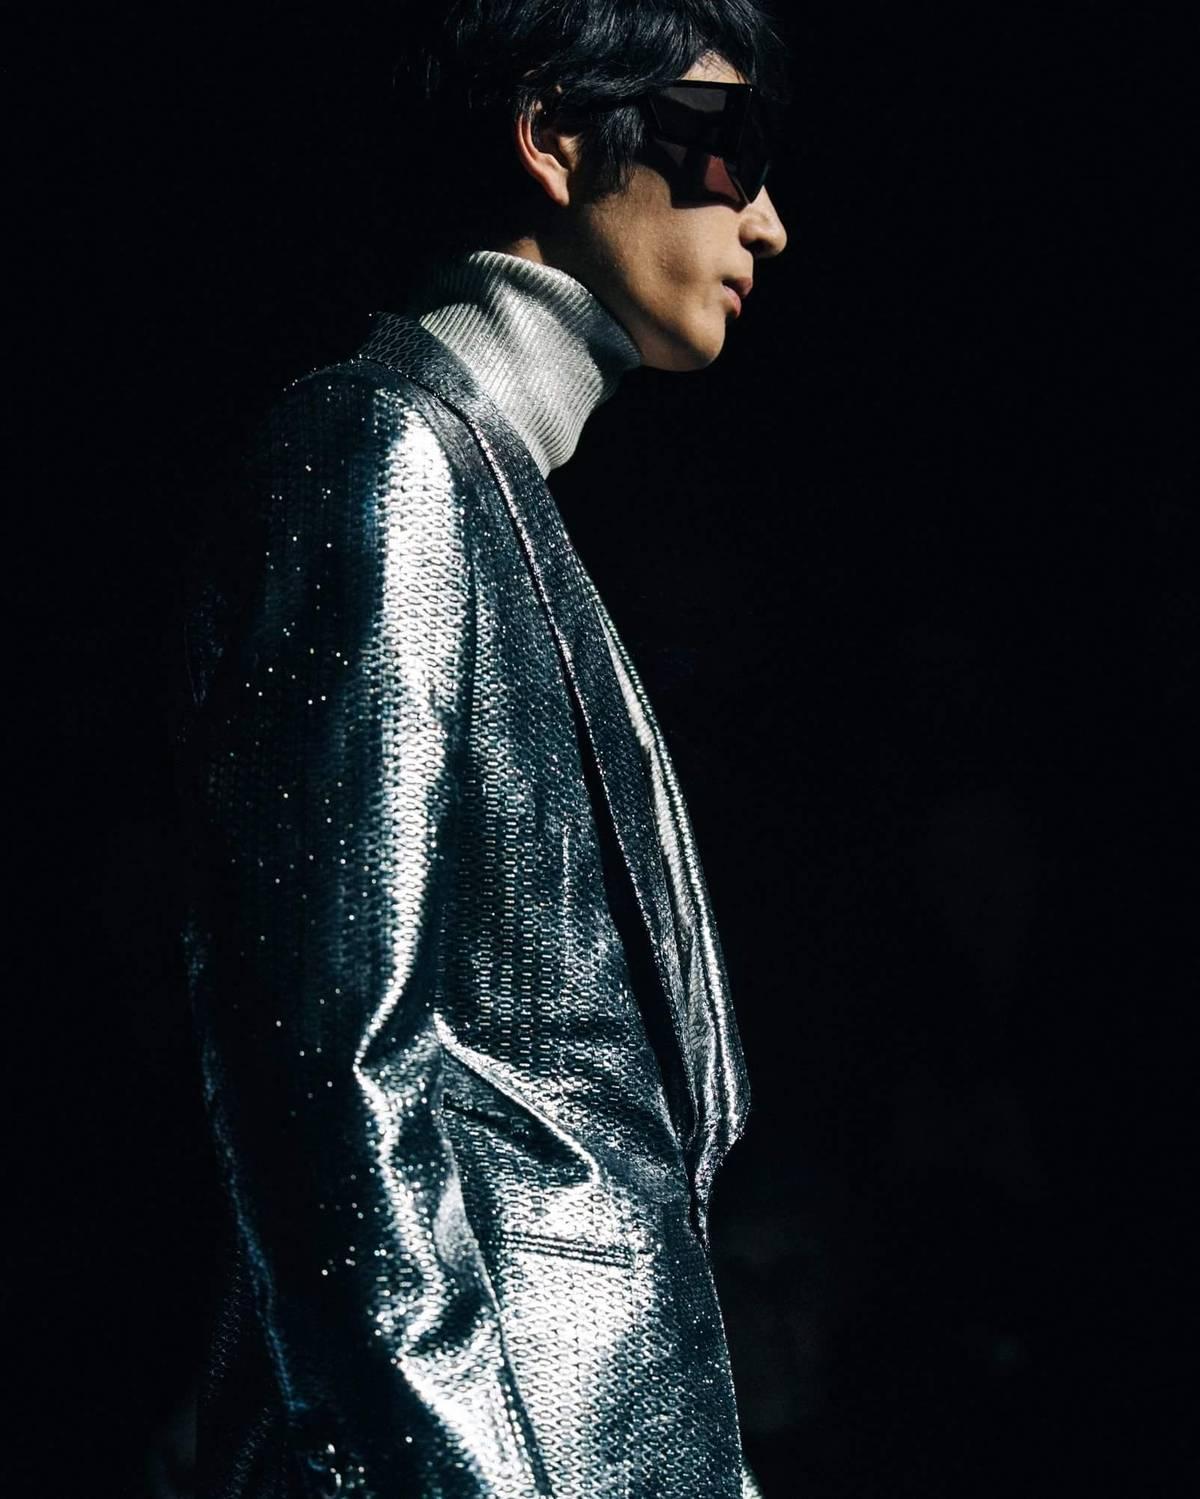 TOM FORD Menswear Fall-Winter 2018/19 at New York Fashion ...